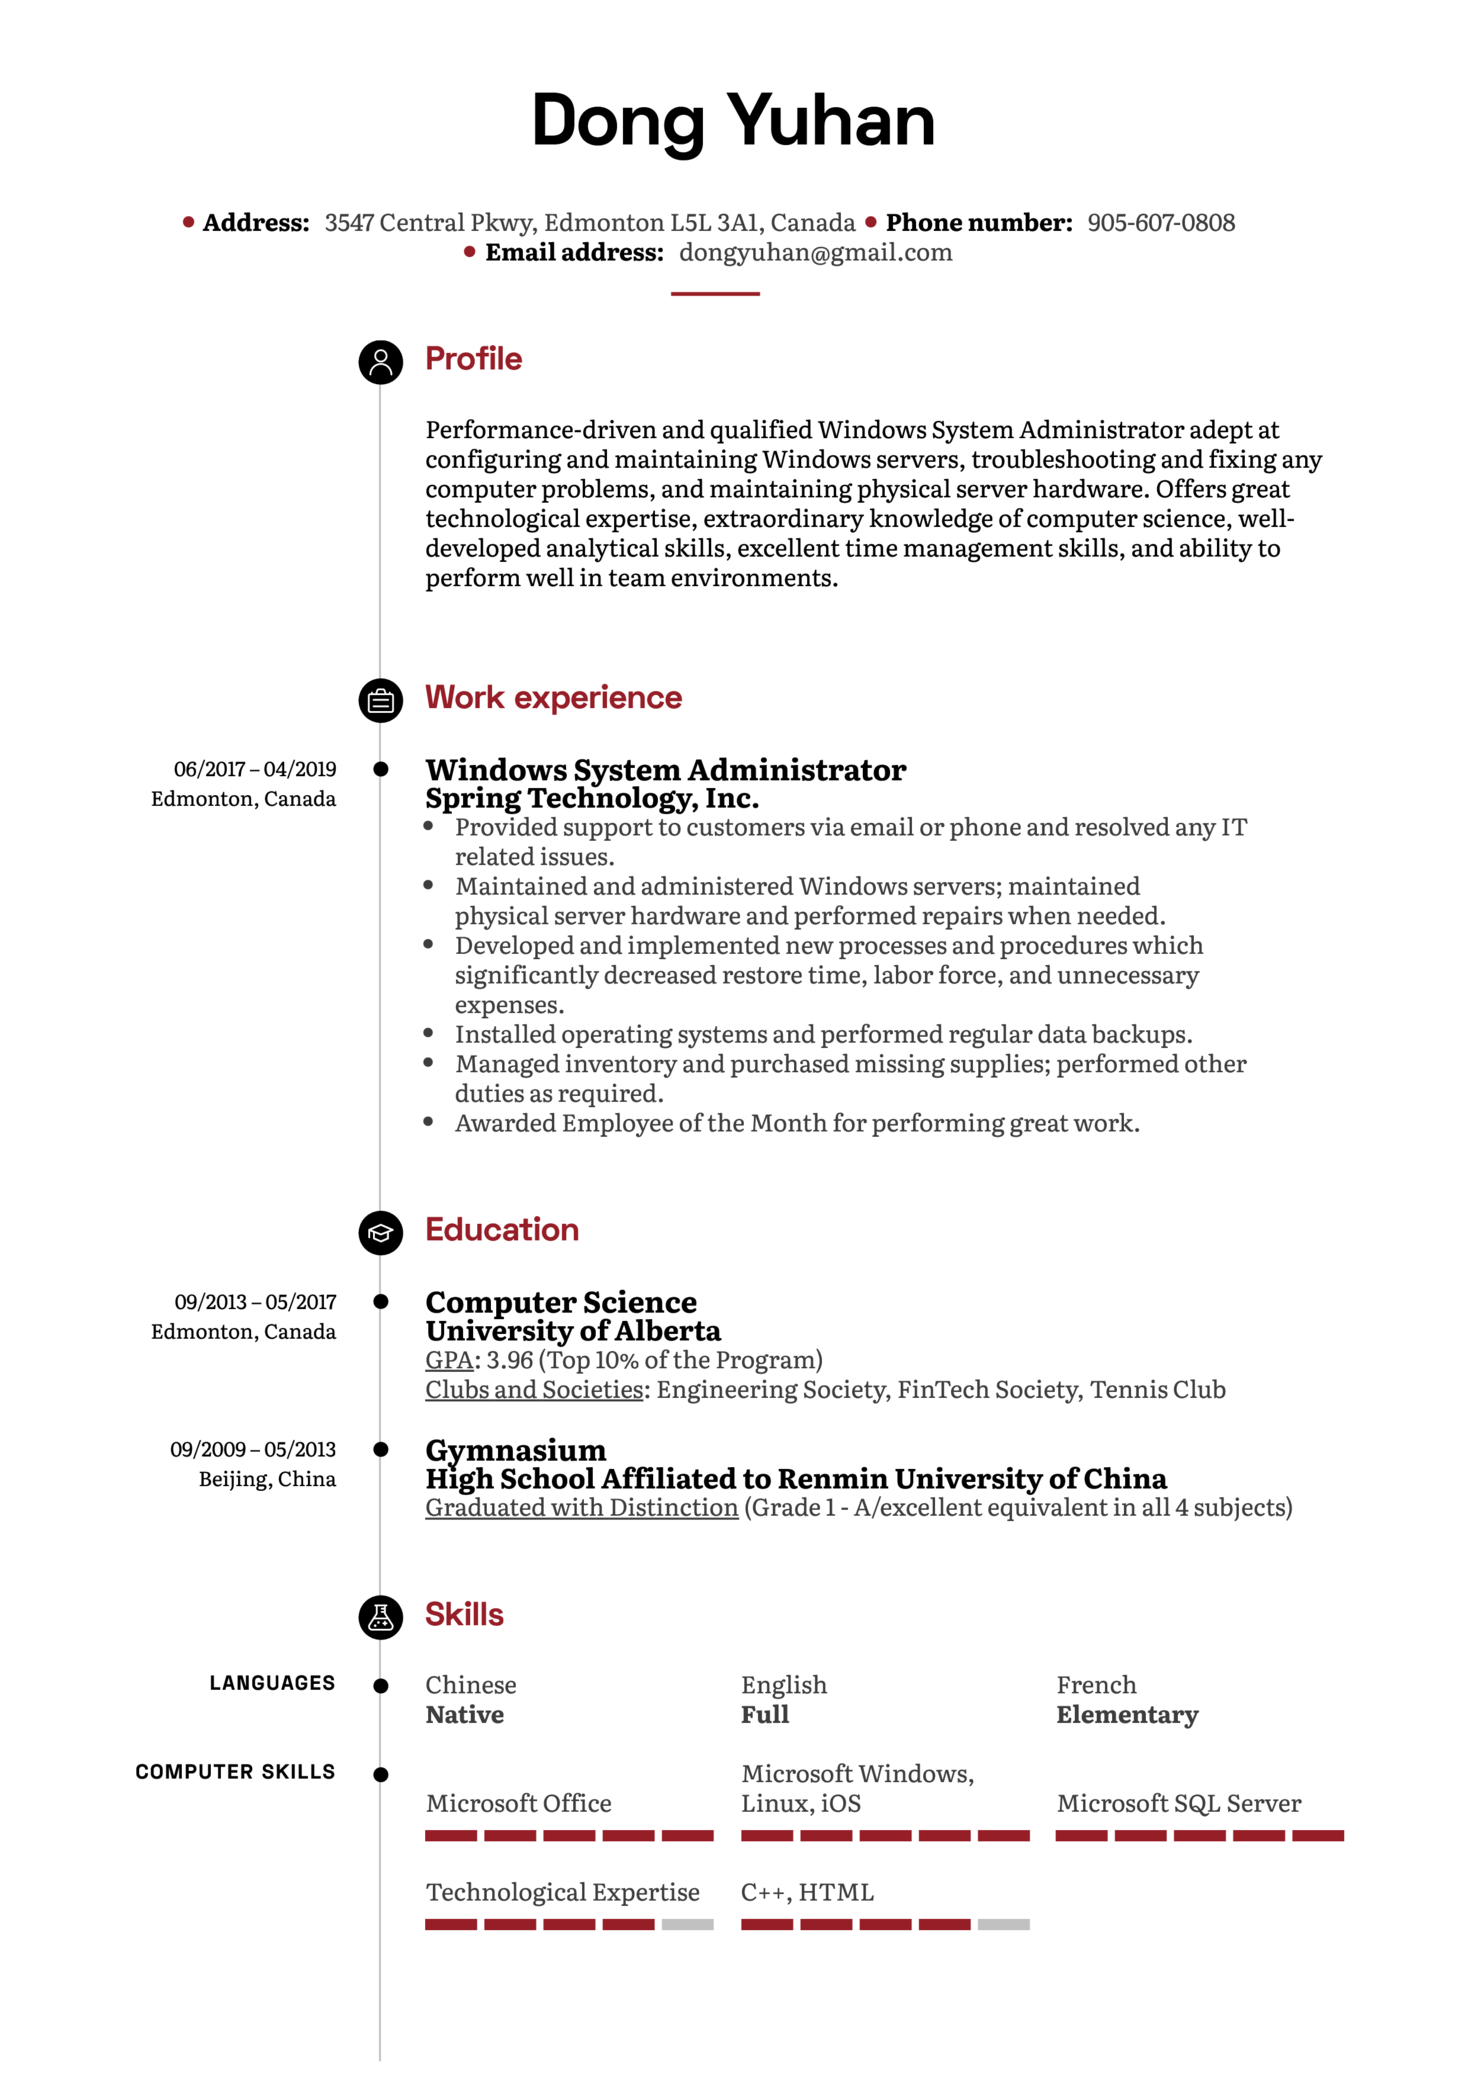 Windows System Administrator Resume Sample (parte 1)